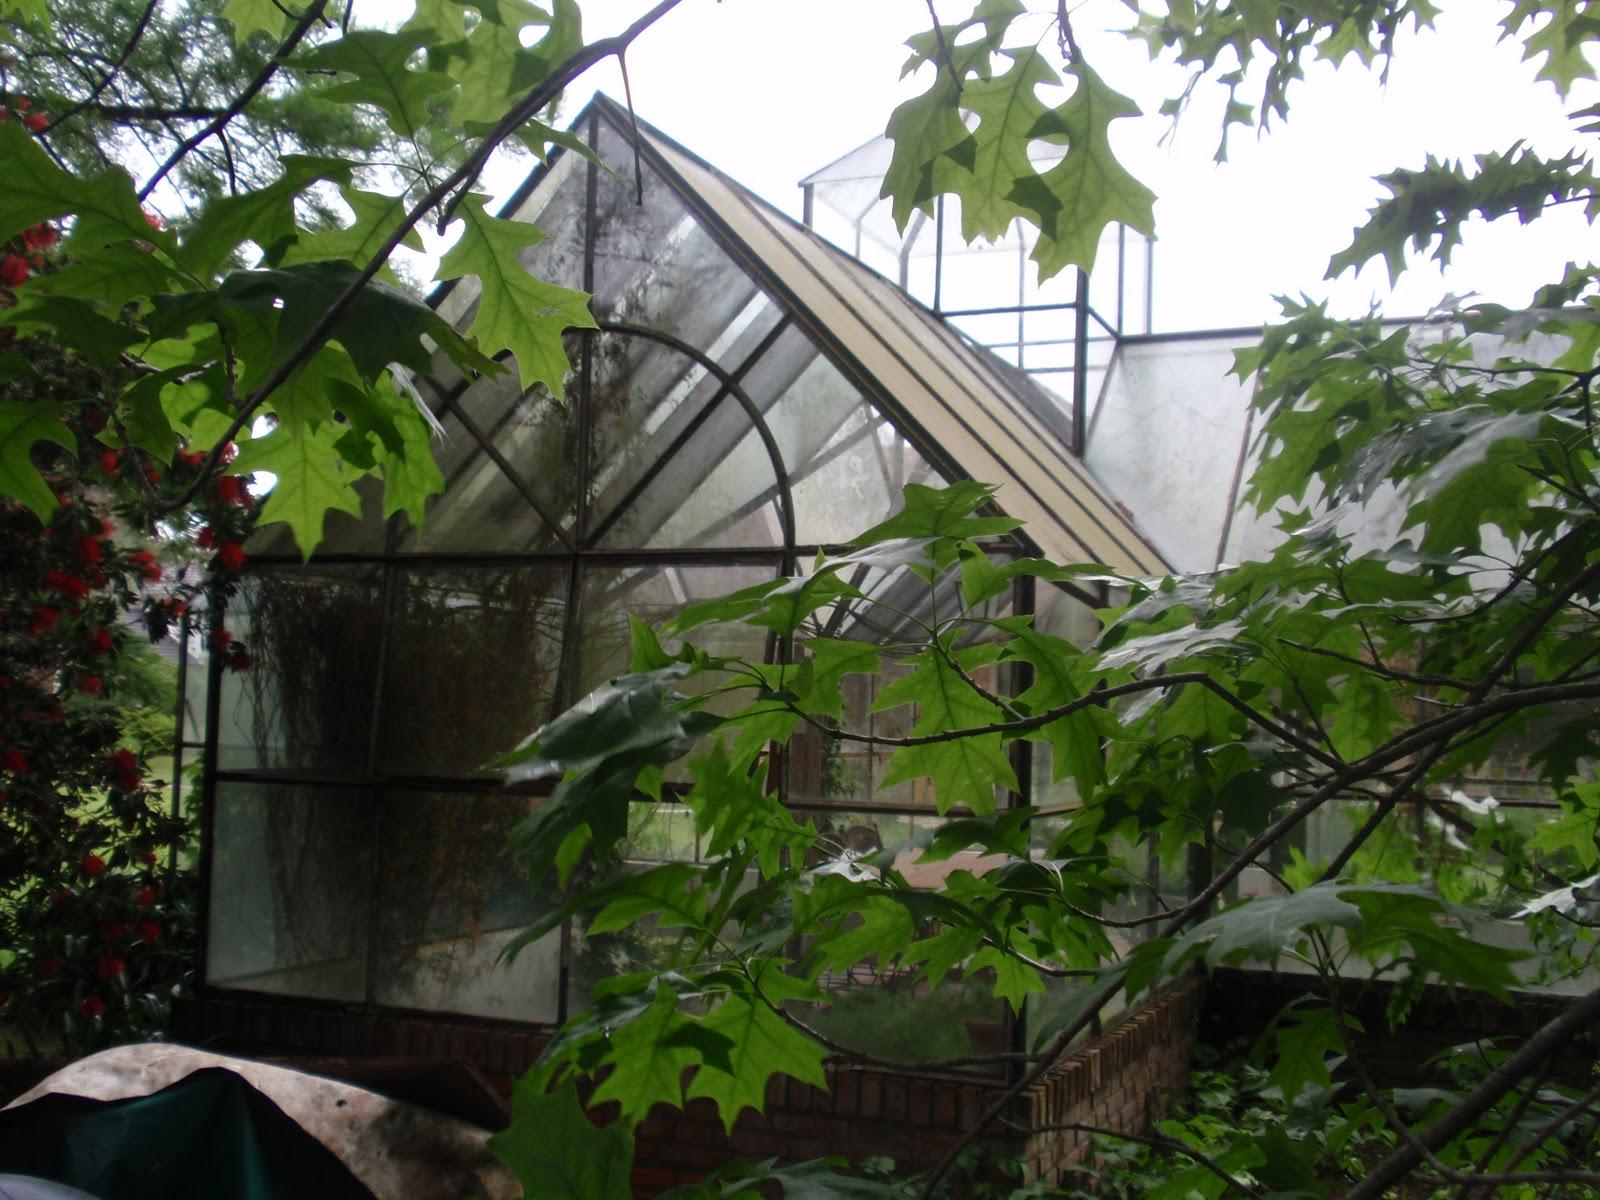 Bonheur maison proyecto jardin - Jardin de invierno ...